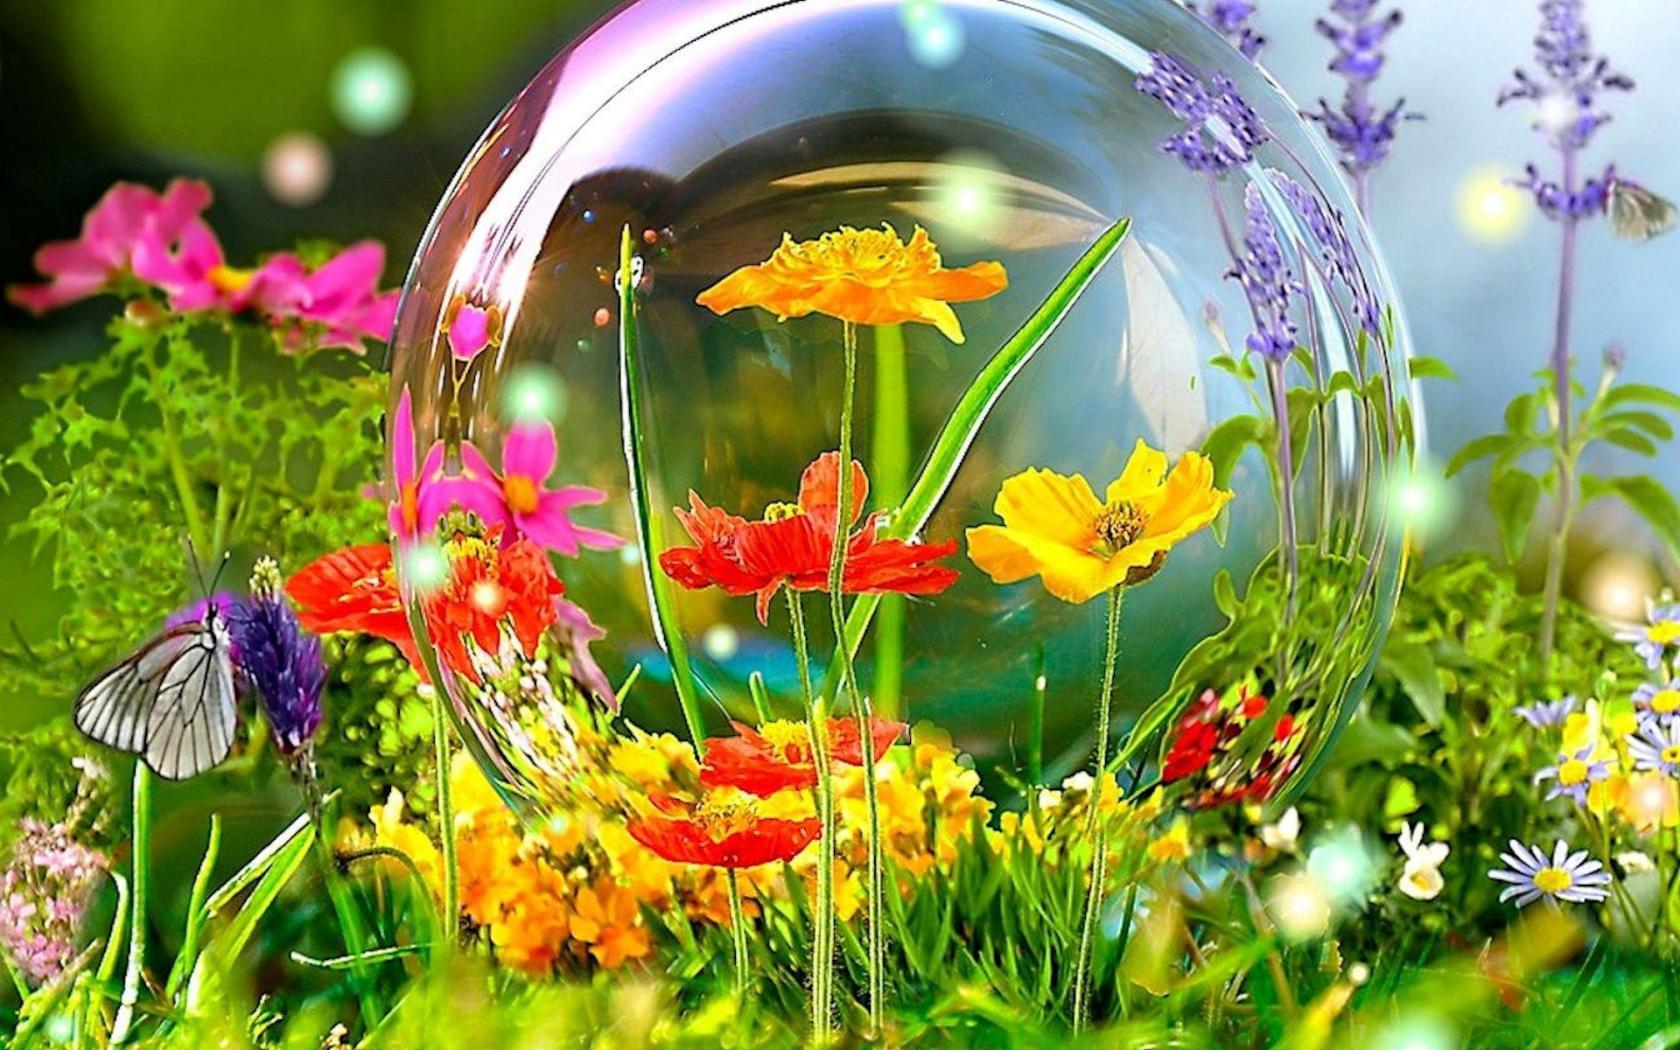 45] Spring Desktop Wallpaper Widescreen on WallpaperSafari 1680x1050